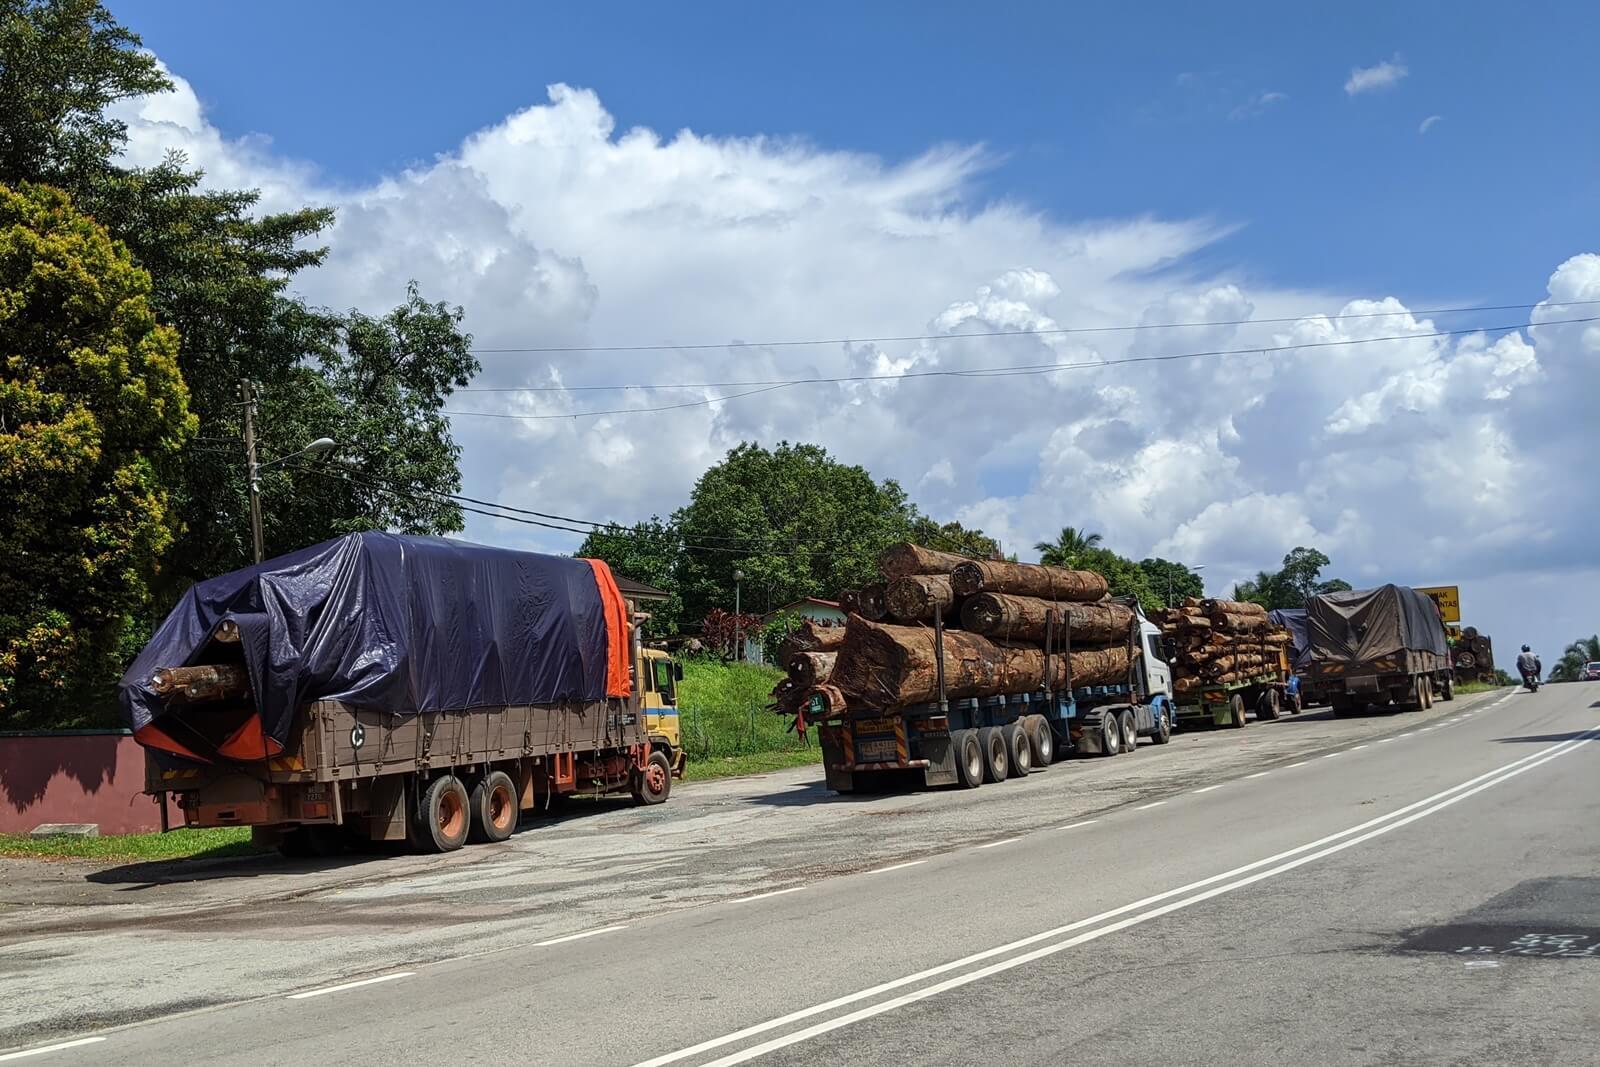 Trucks carrying logs in Mersing district, Johor, June 2020.